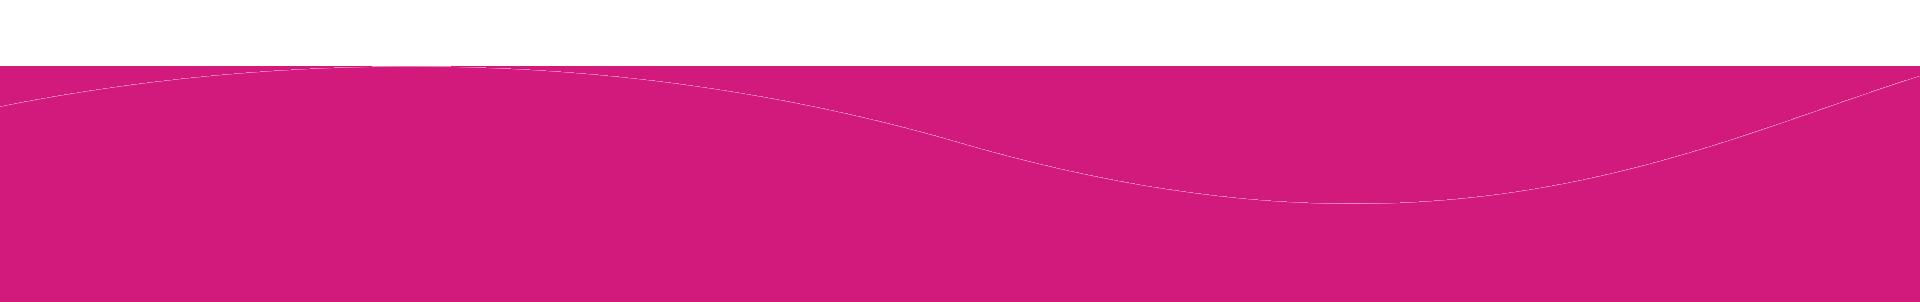 paralax-rosa.png